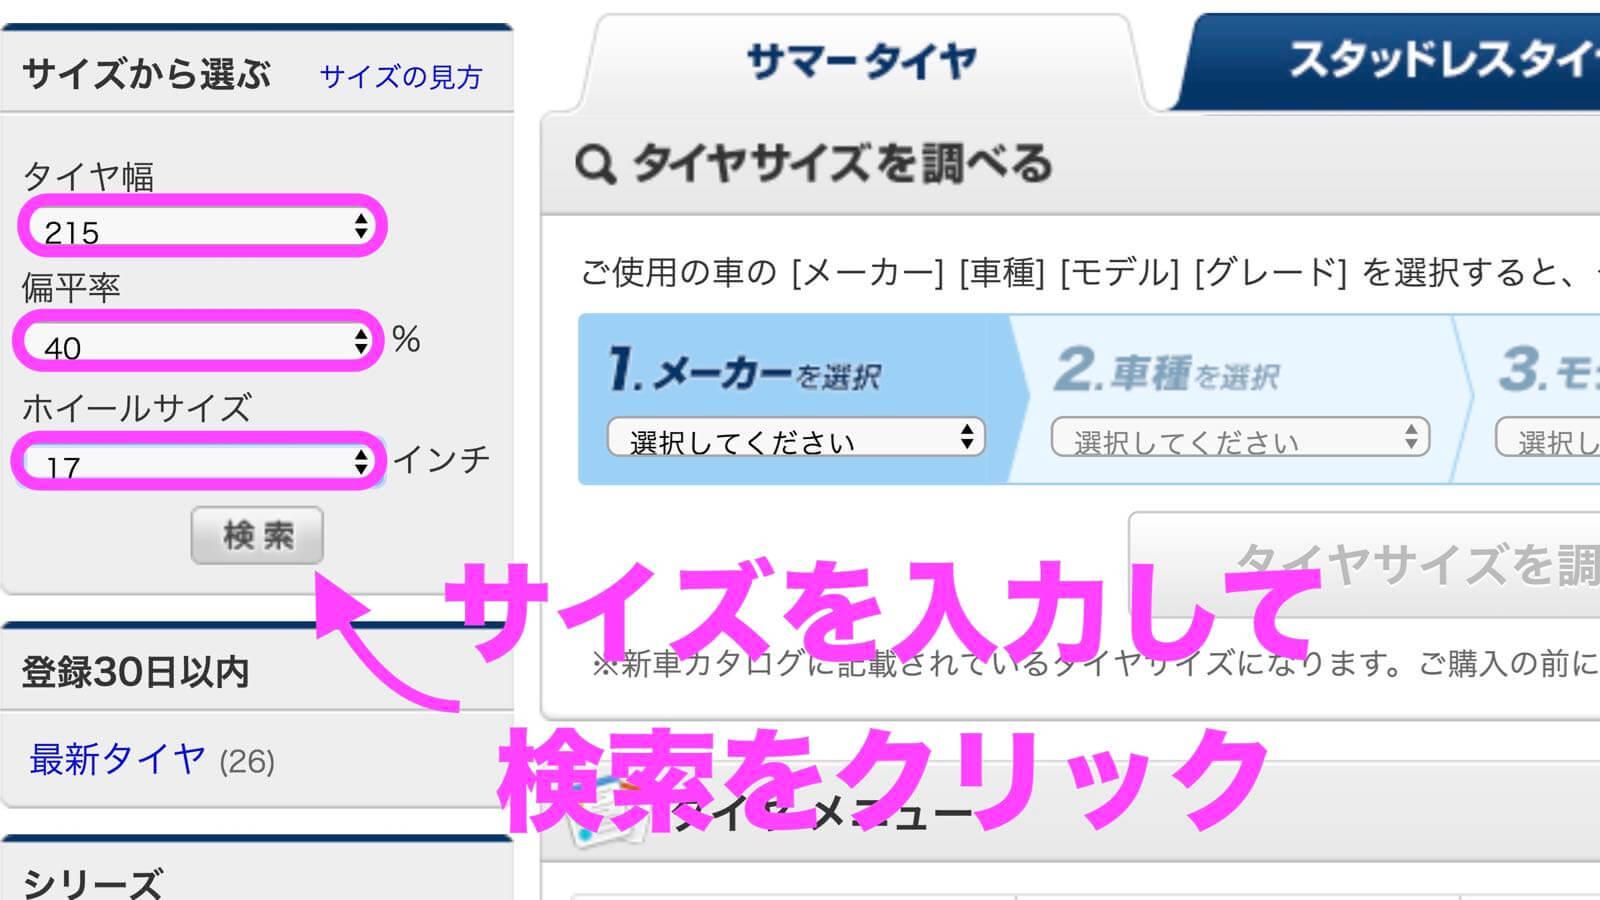 0129 MR2 Restore Plan  Part 6 03 kakaku com tire search